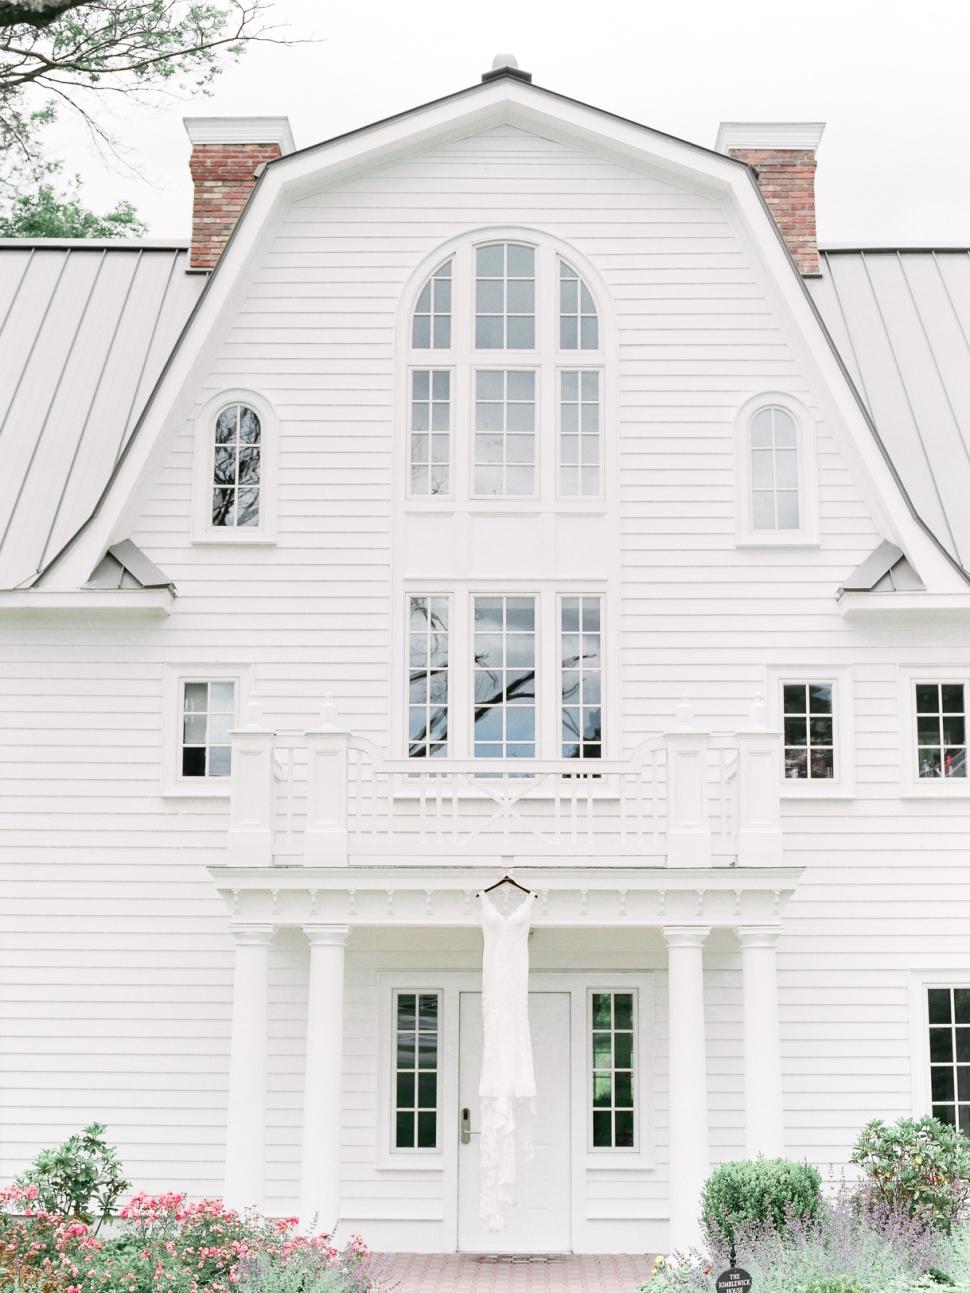 Ryland-Inn-Wedding-Photographer-Cassi-Claire_Ryland-Inn-Wedding_02.jpg